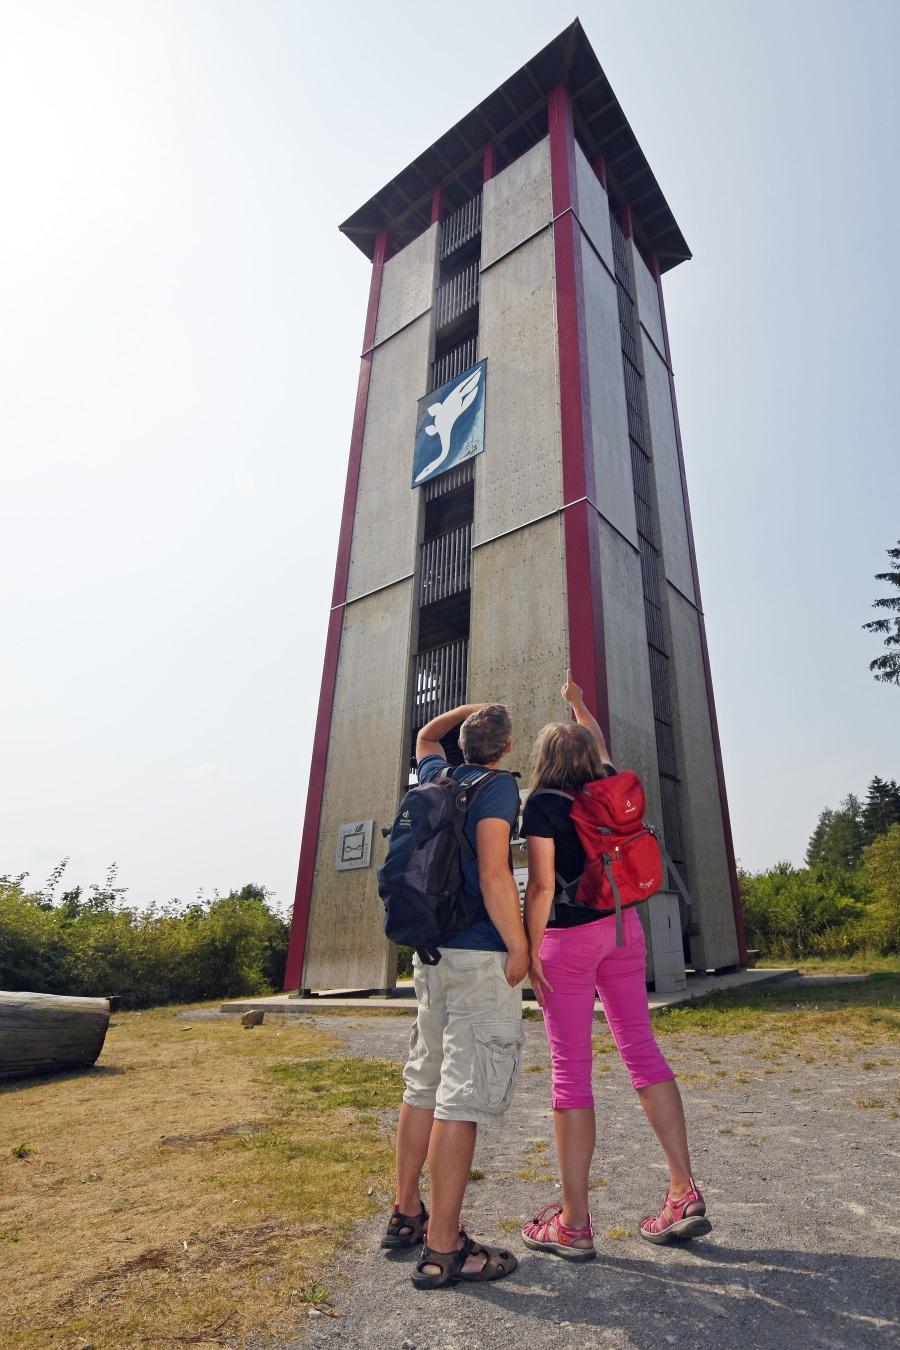 Lattbergturm in Entrup